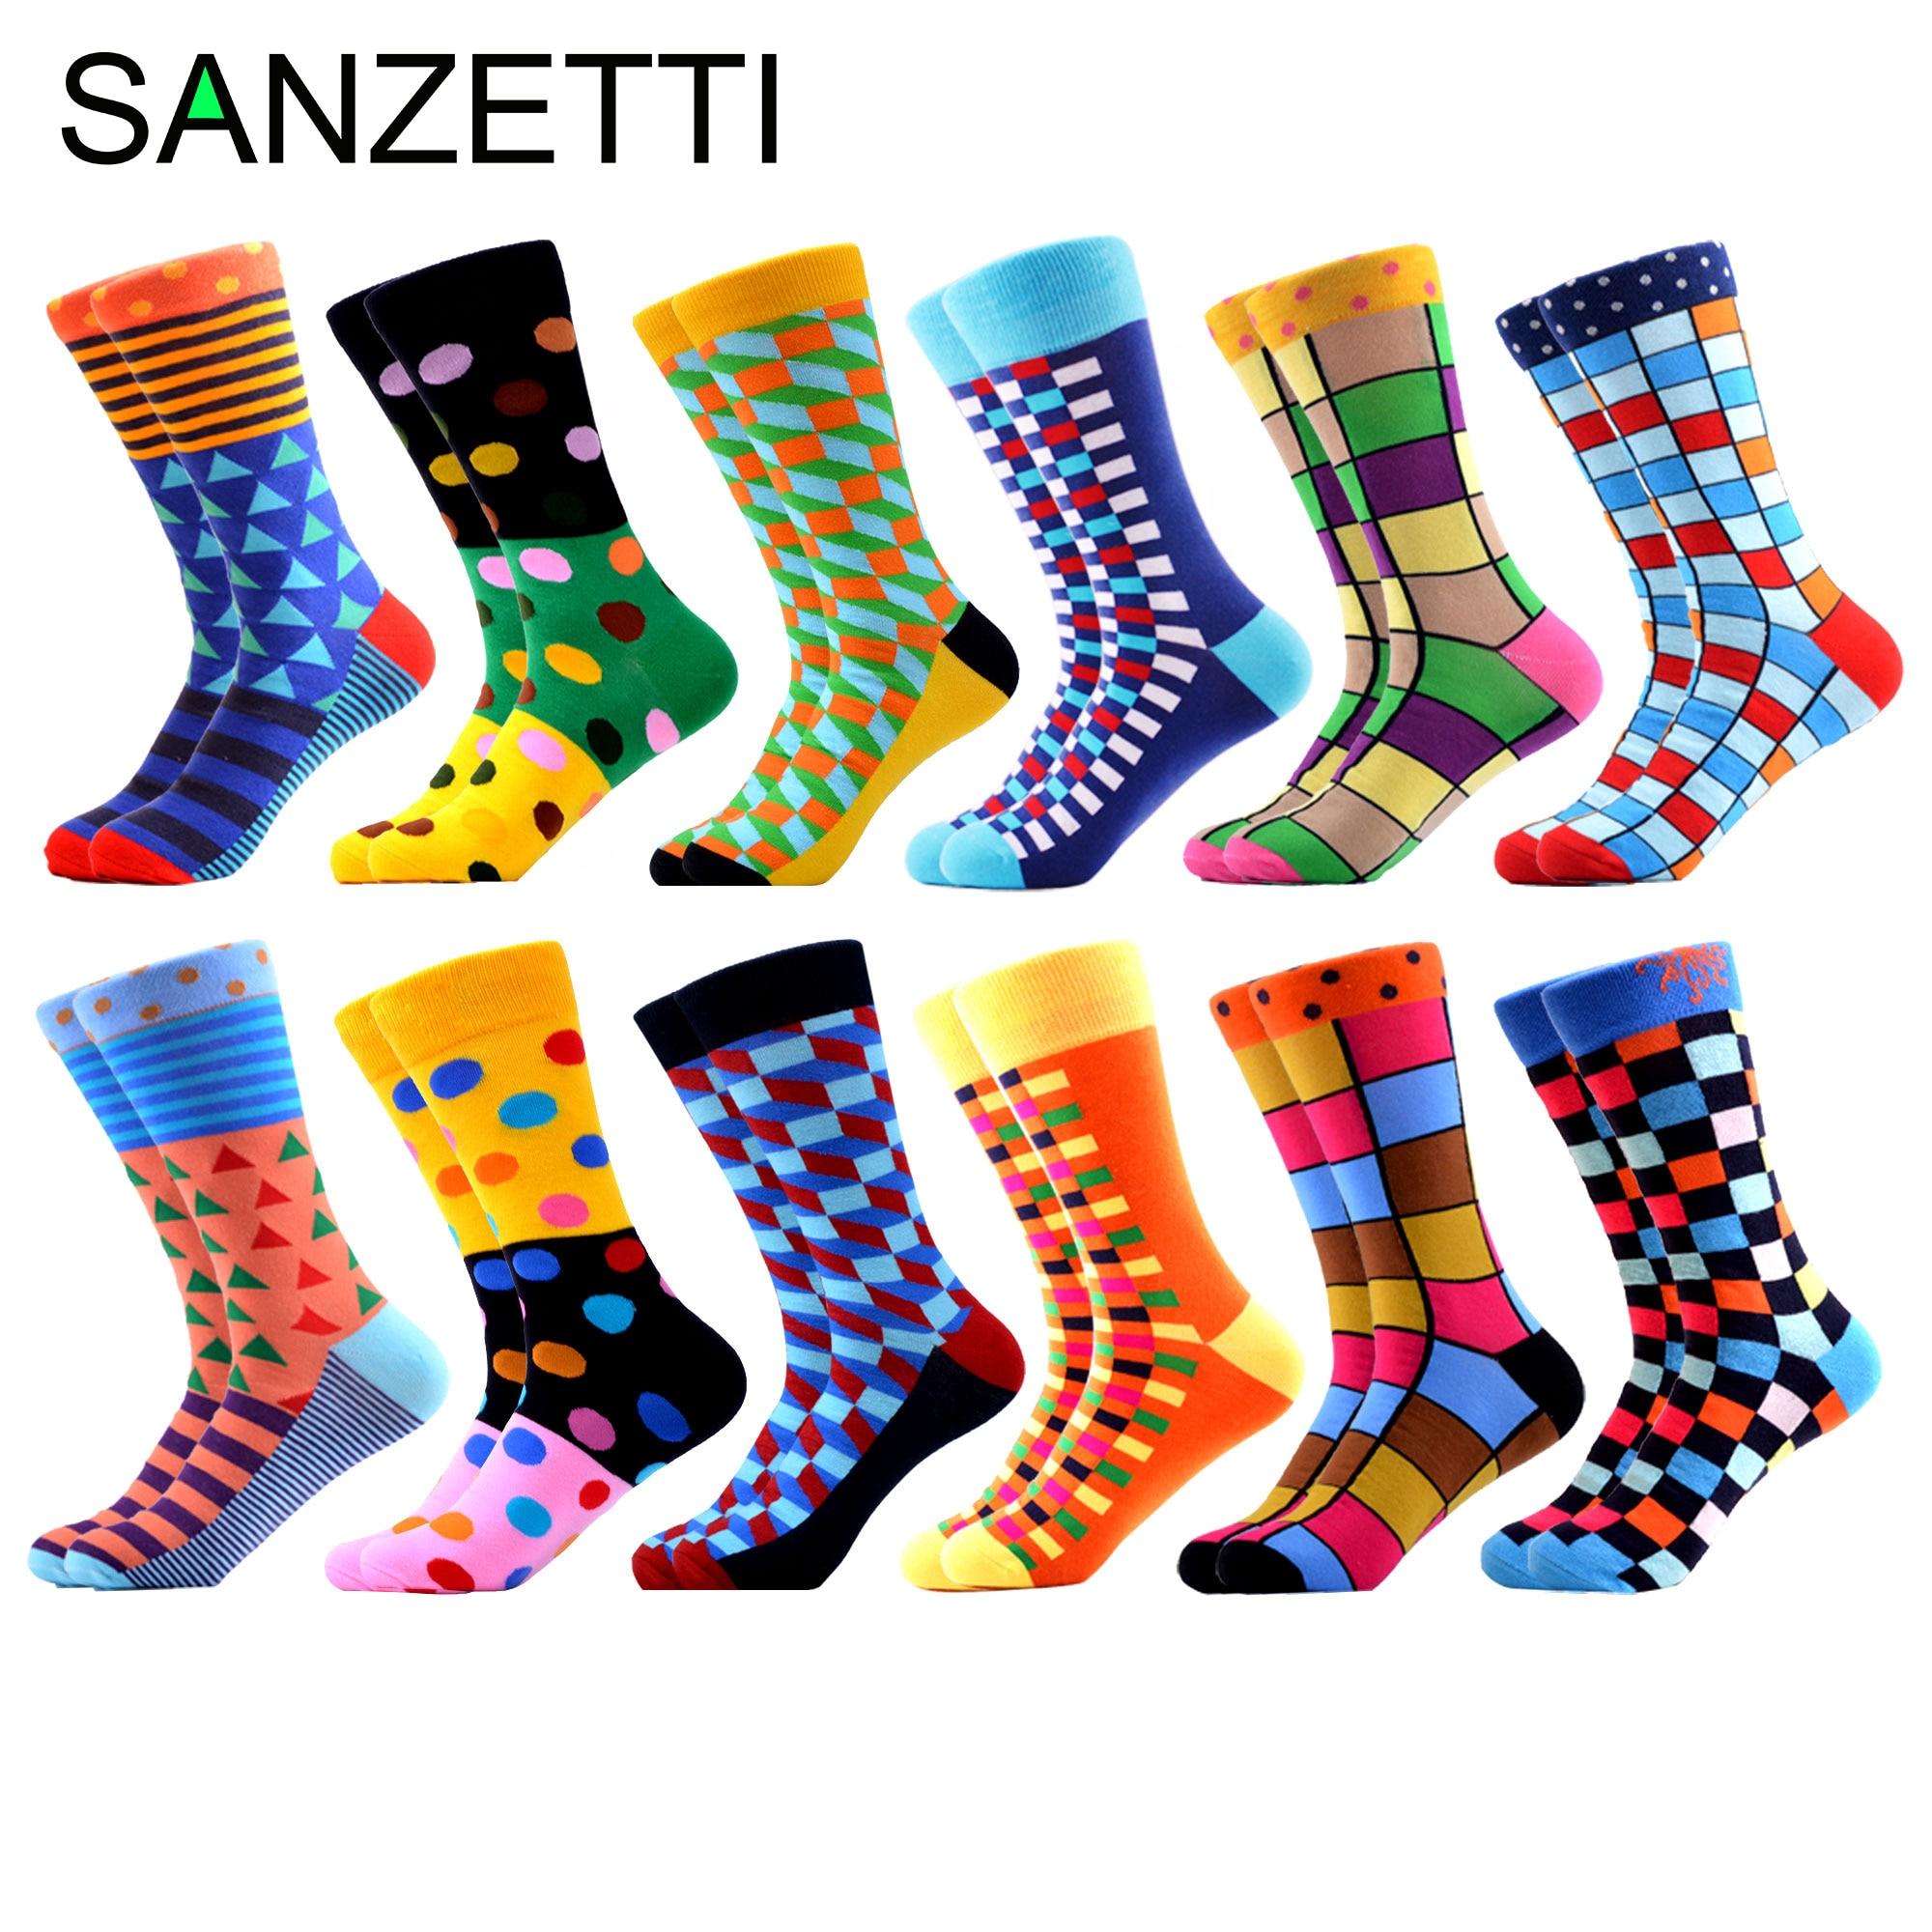 SANZETTI Men's Socks Hip Hop High Colorful Combed Cotton Happy Novelty Quality Skateboard Plaid Geometric Harajuku Gifts Socks недорого